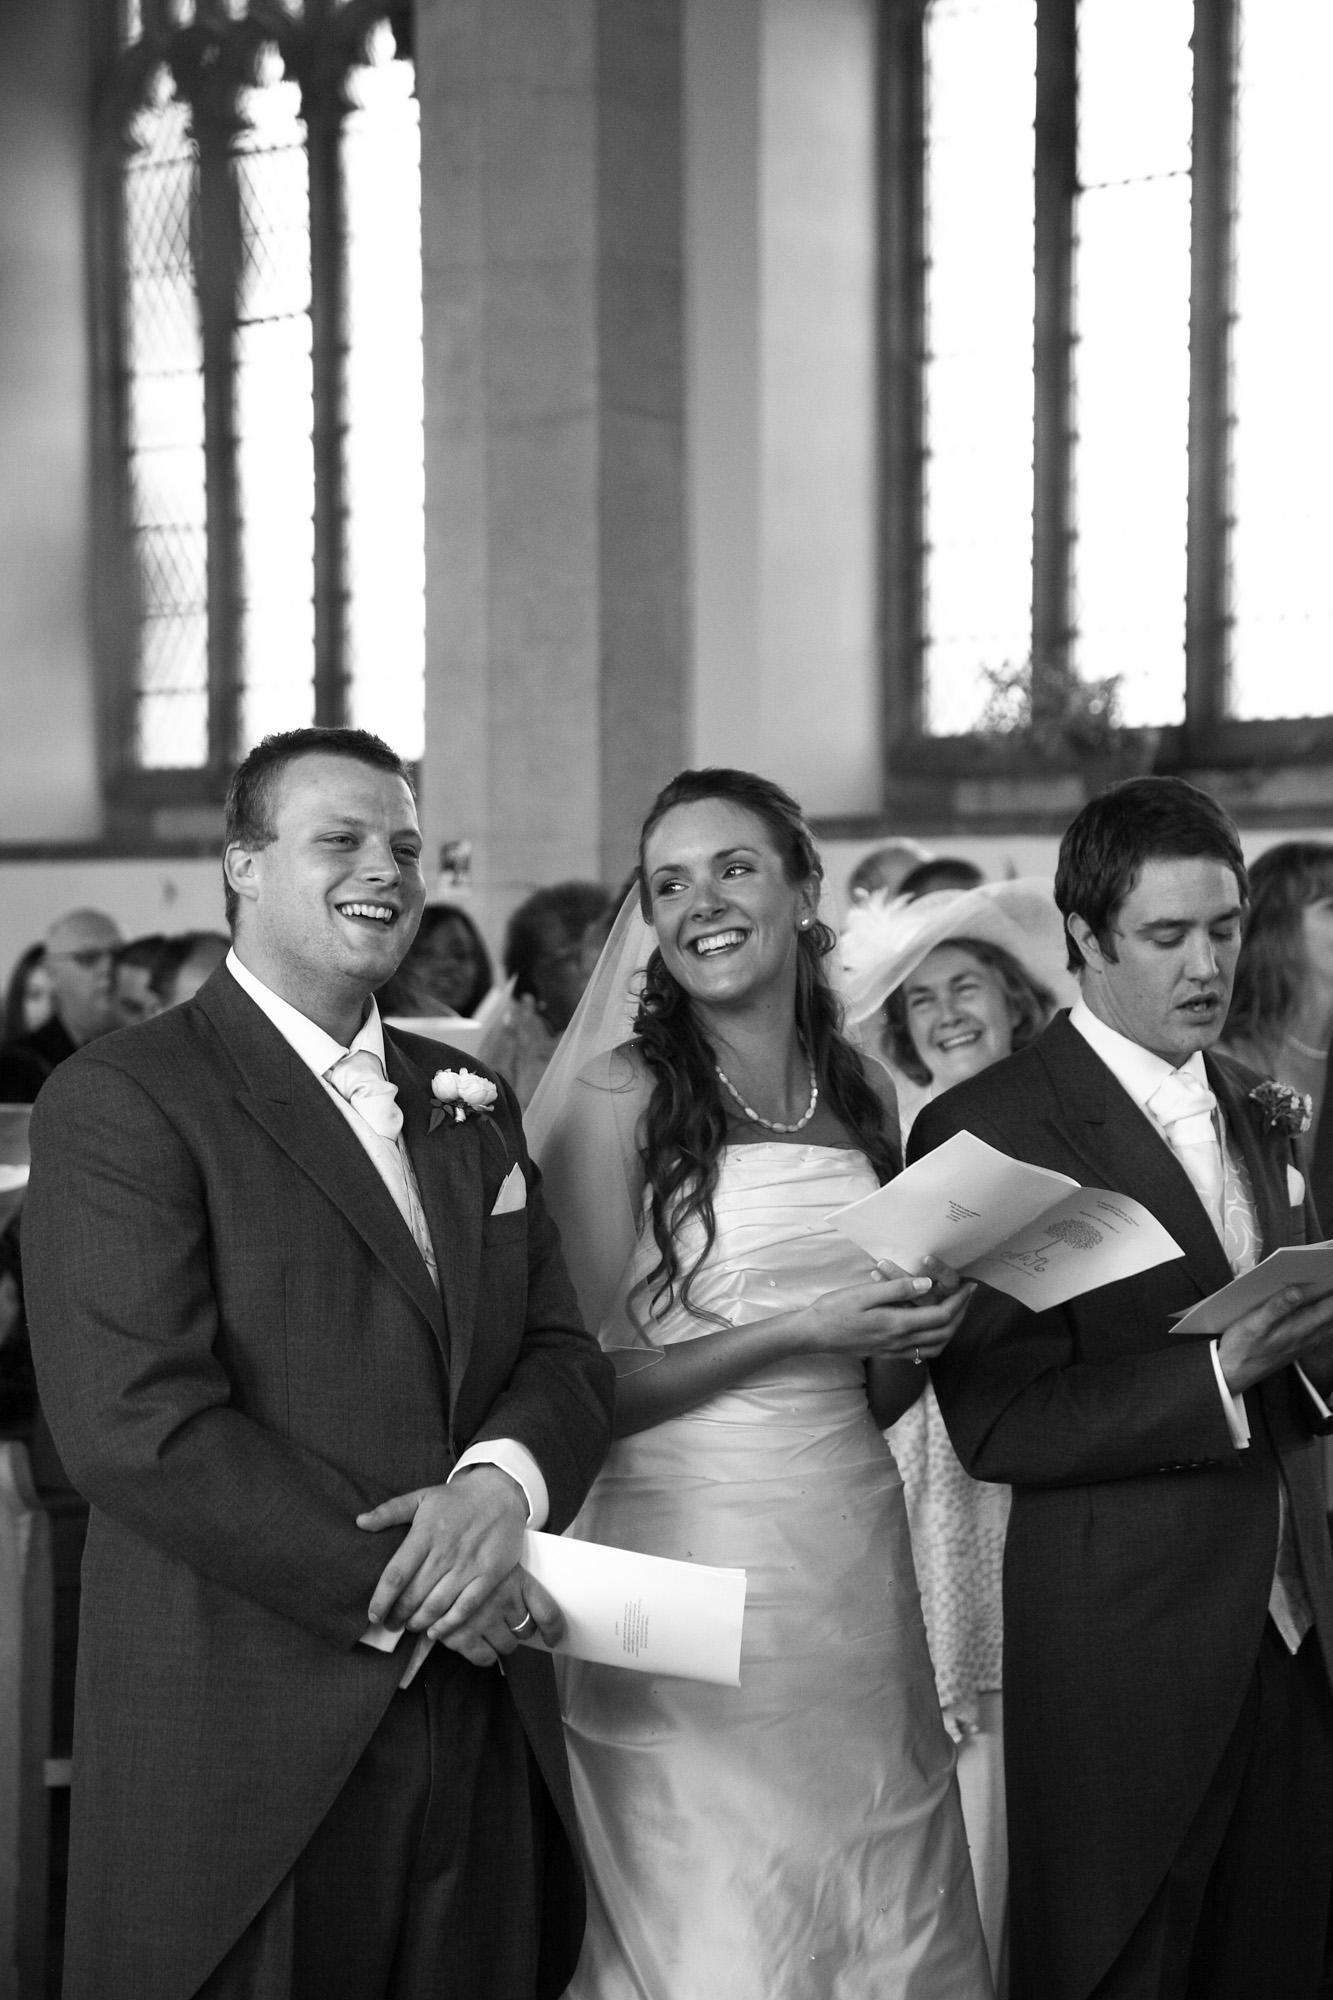 weddings-couples-love-photographer-oxford-london-jonathan-self-photography-26.jpg